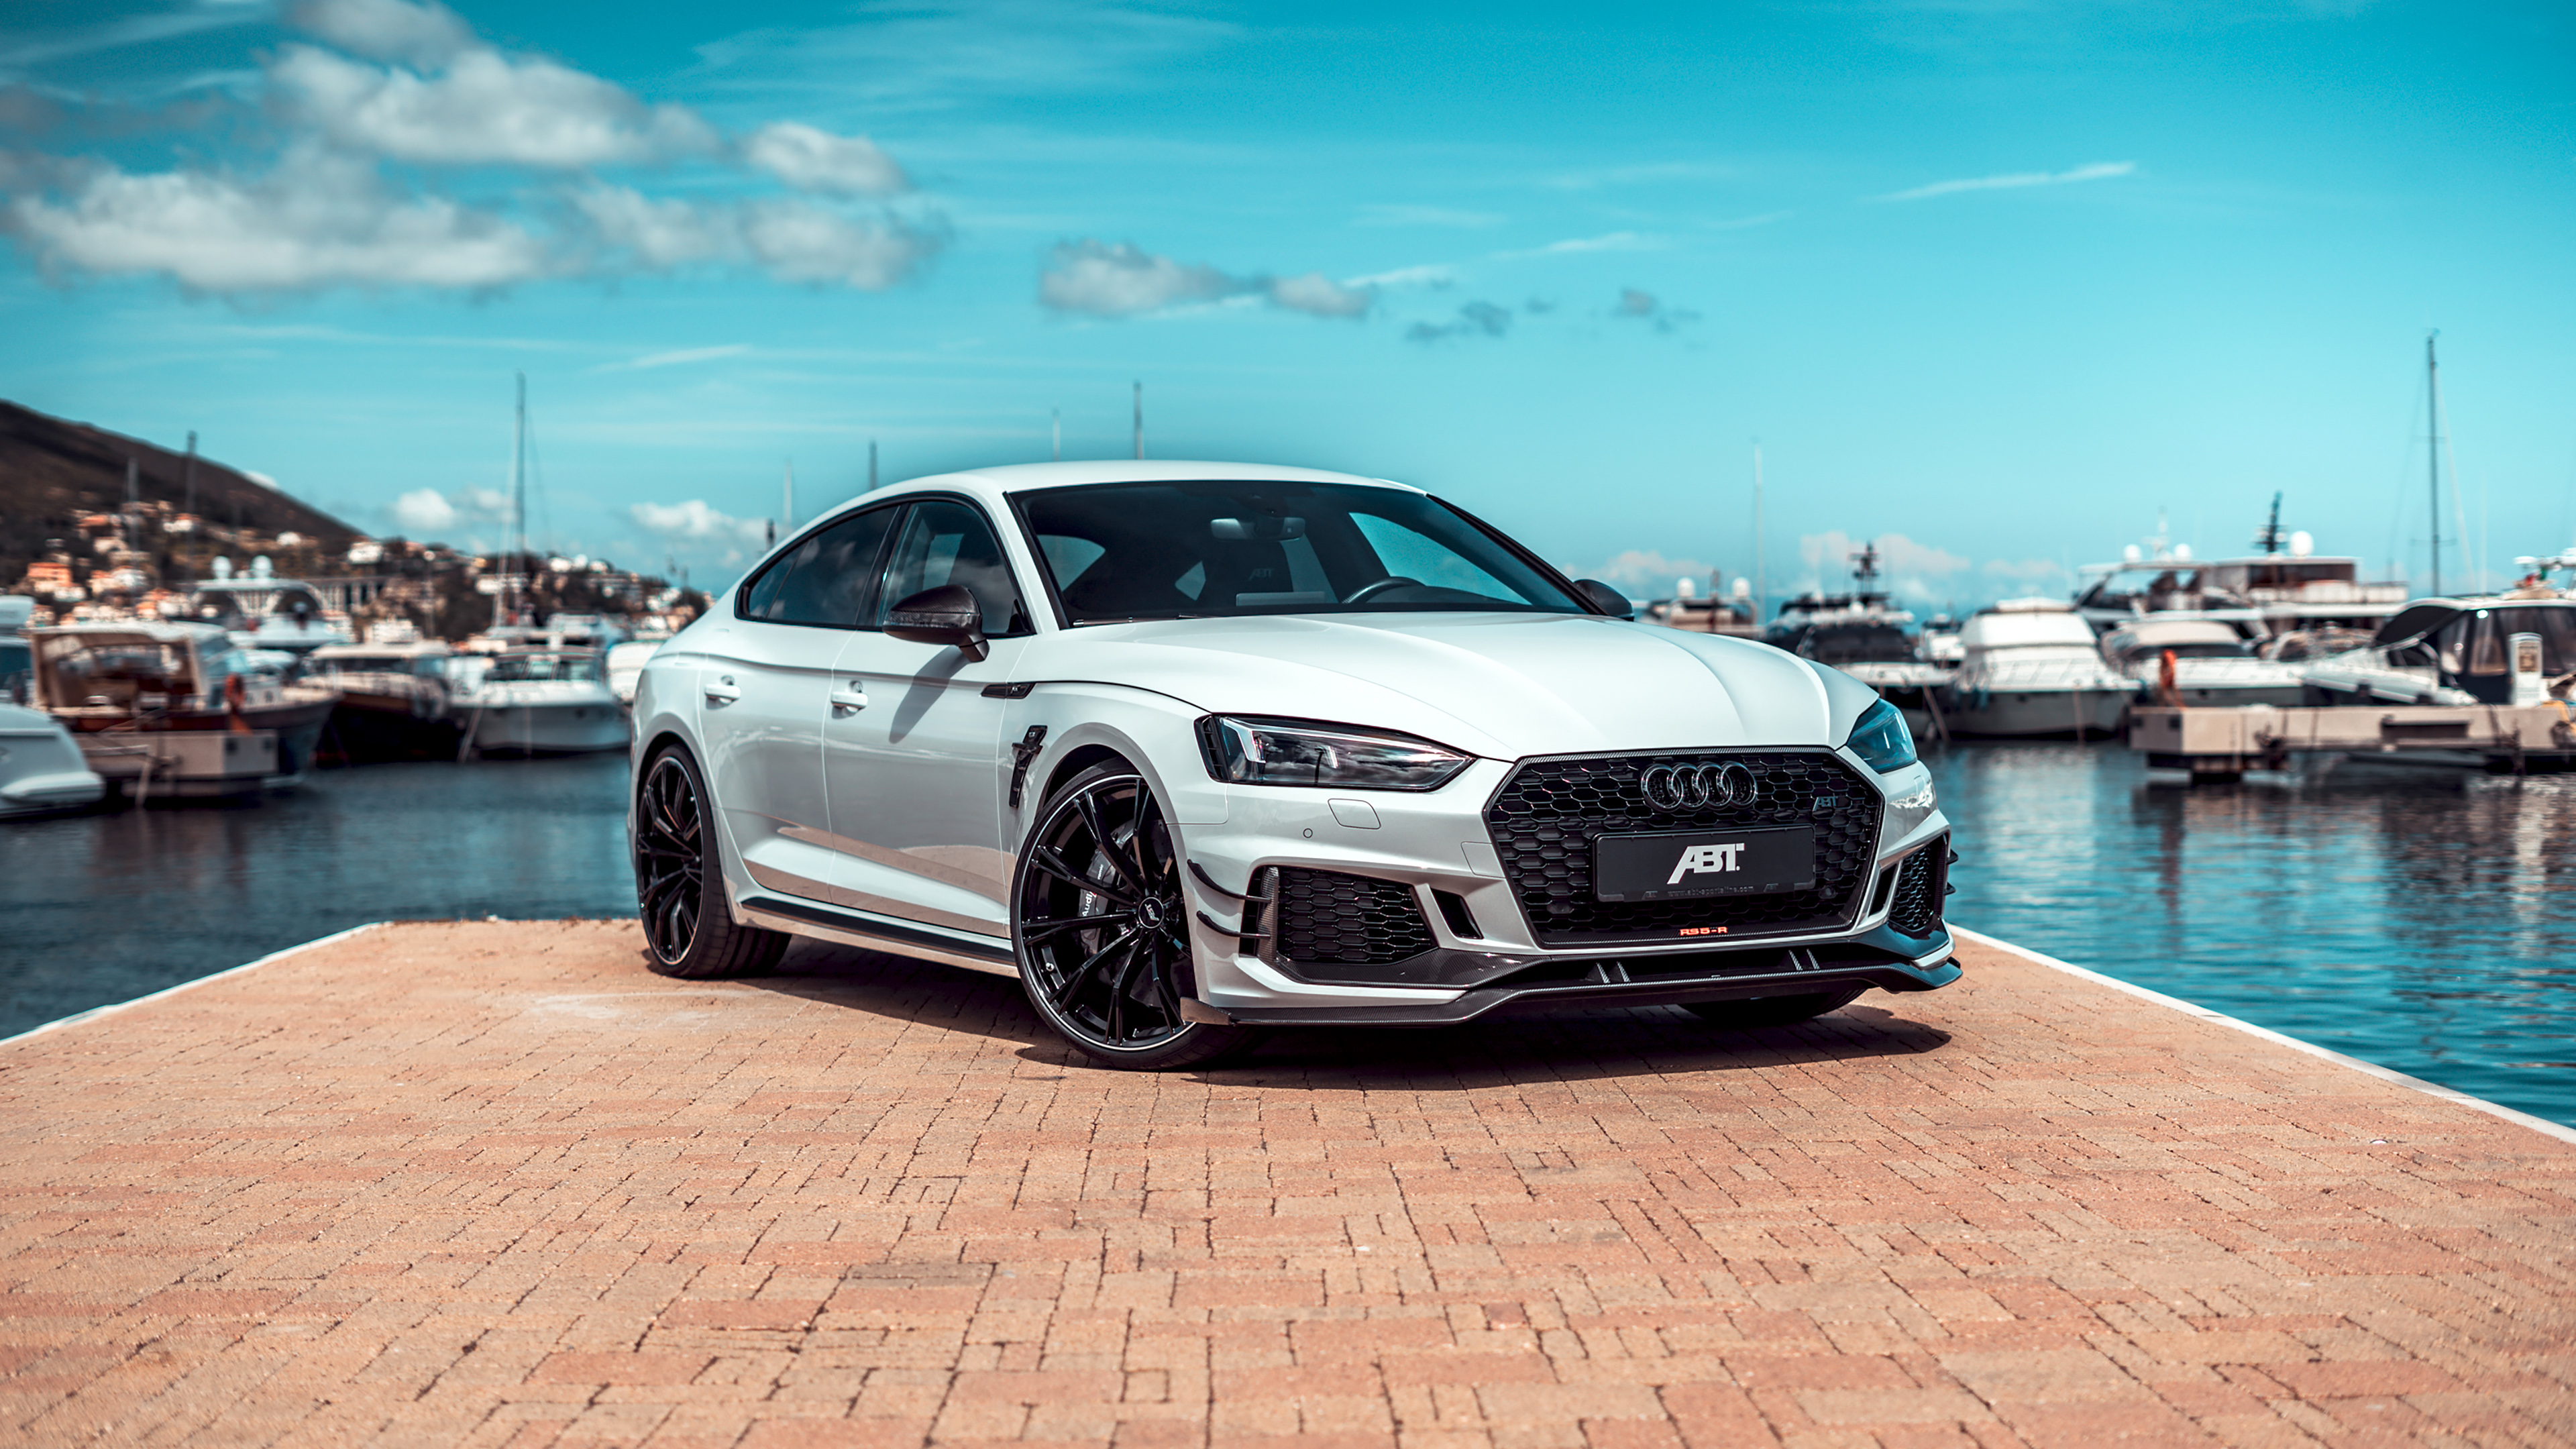 Abt Audi Rs 5 R Sportback 2019 4k Wallpaper Hd Car Wallpapers Id 13006